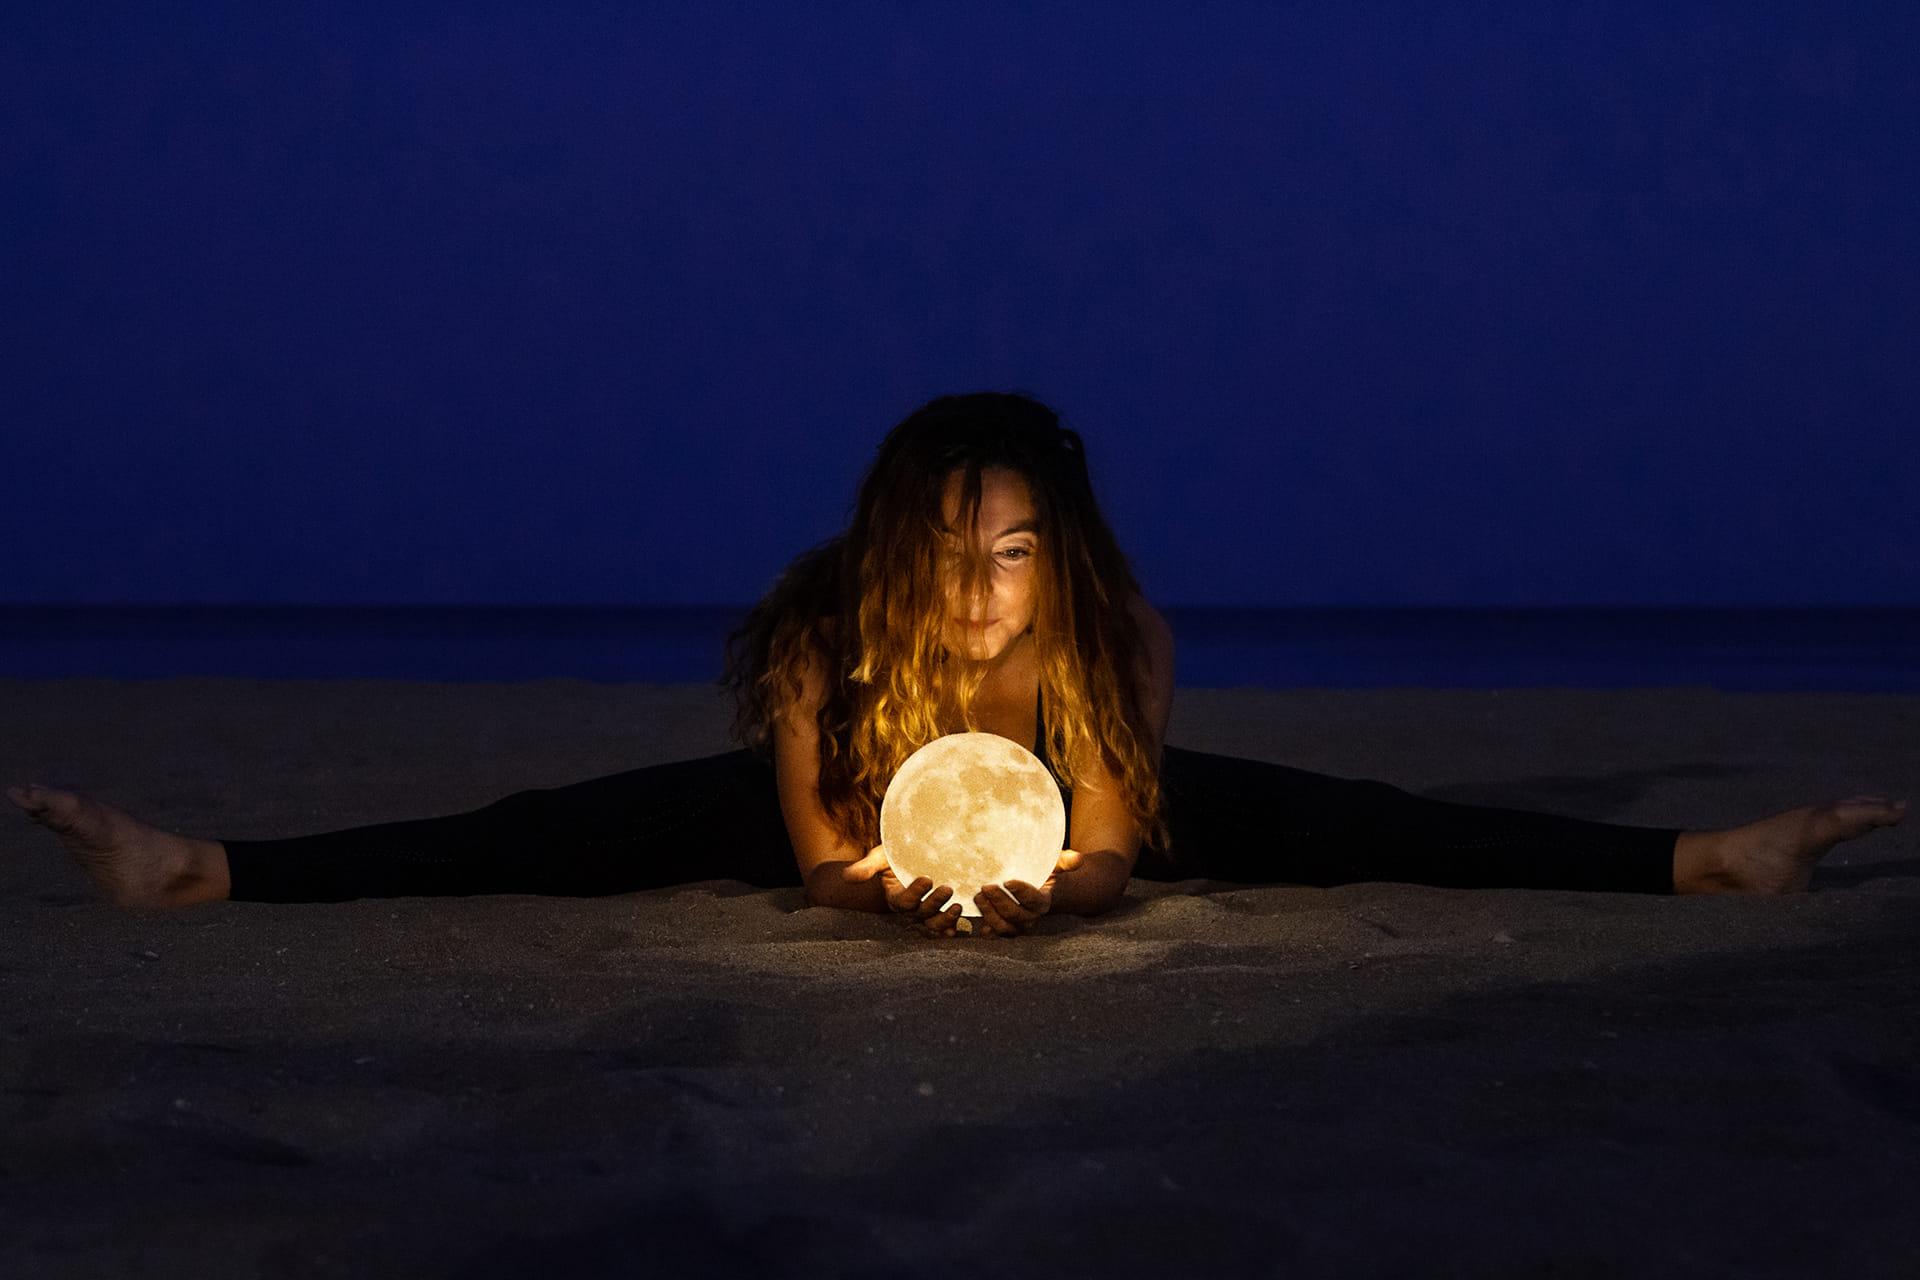 Encontré la Luna dentro la arena